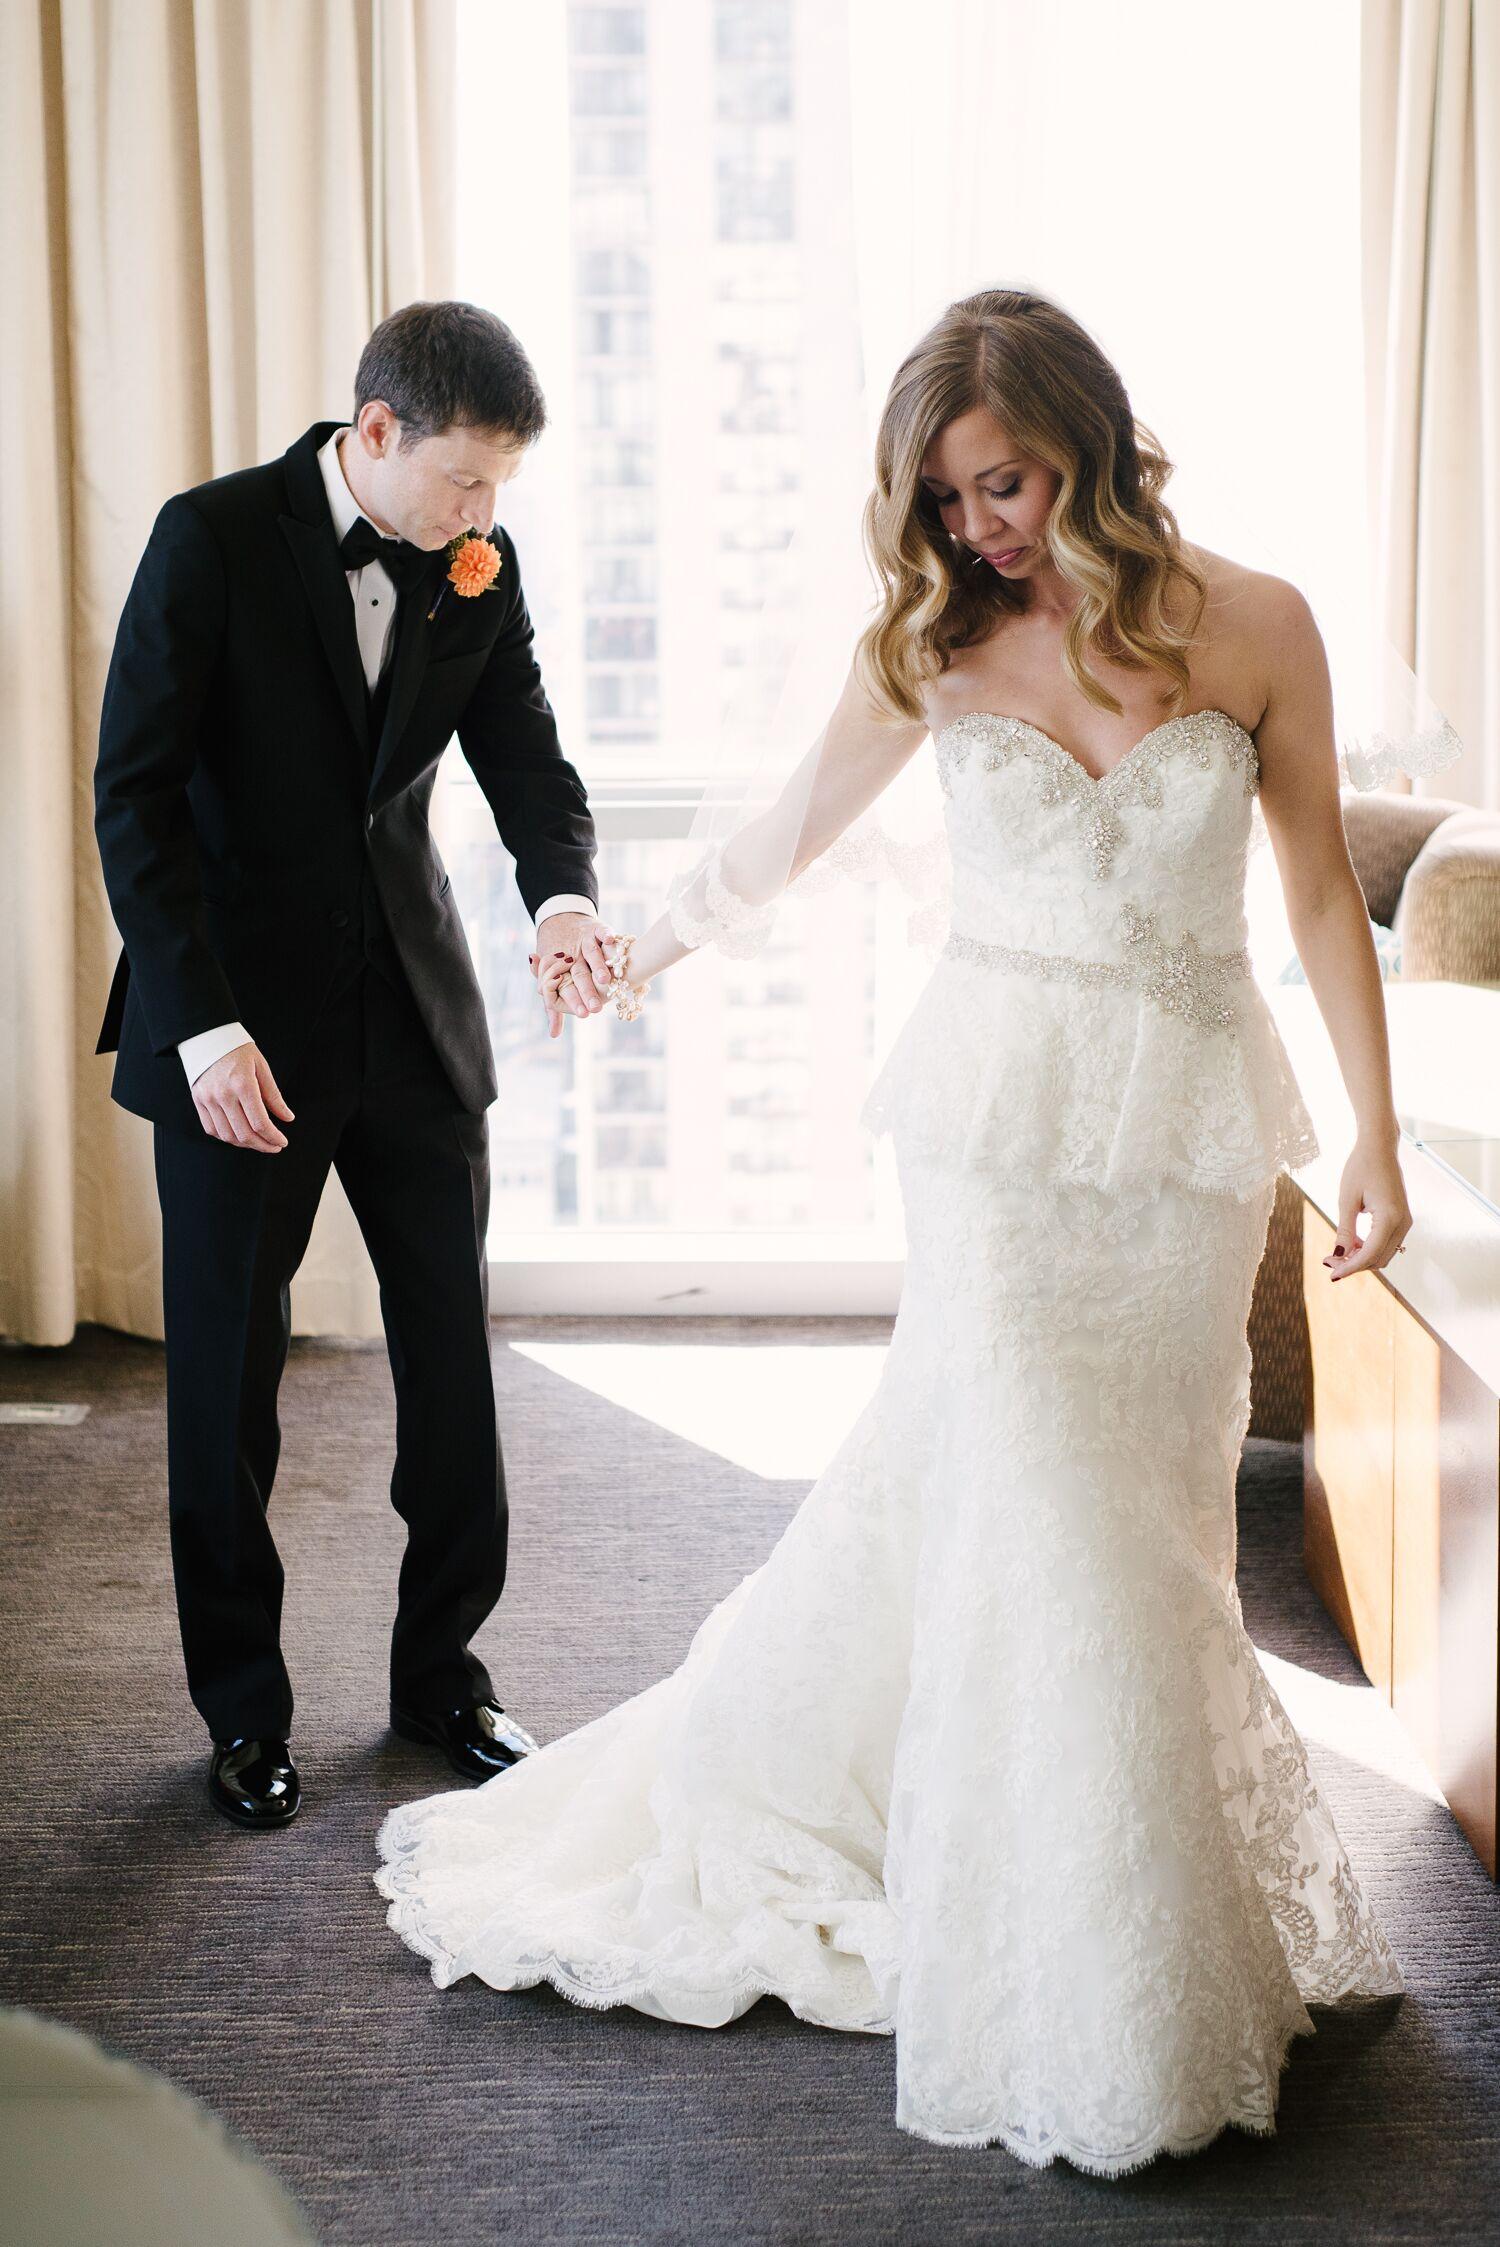 Bride 39 s strapless lace peplum wedding dress for Peplum dresses for wedding guest